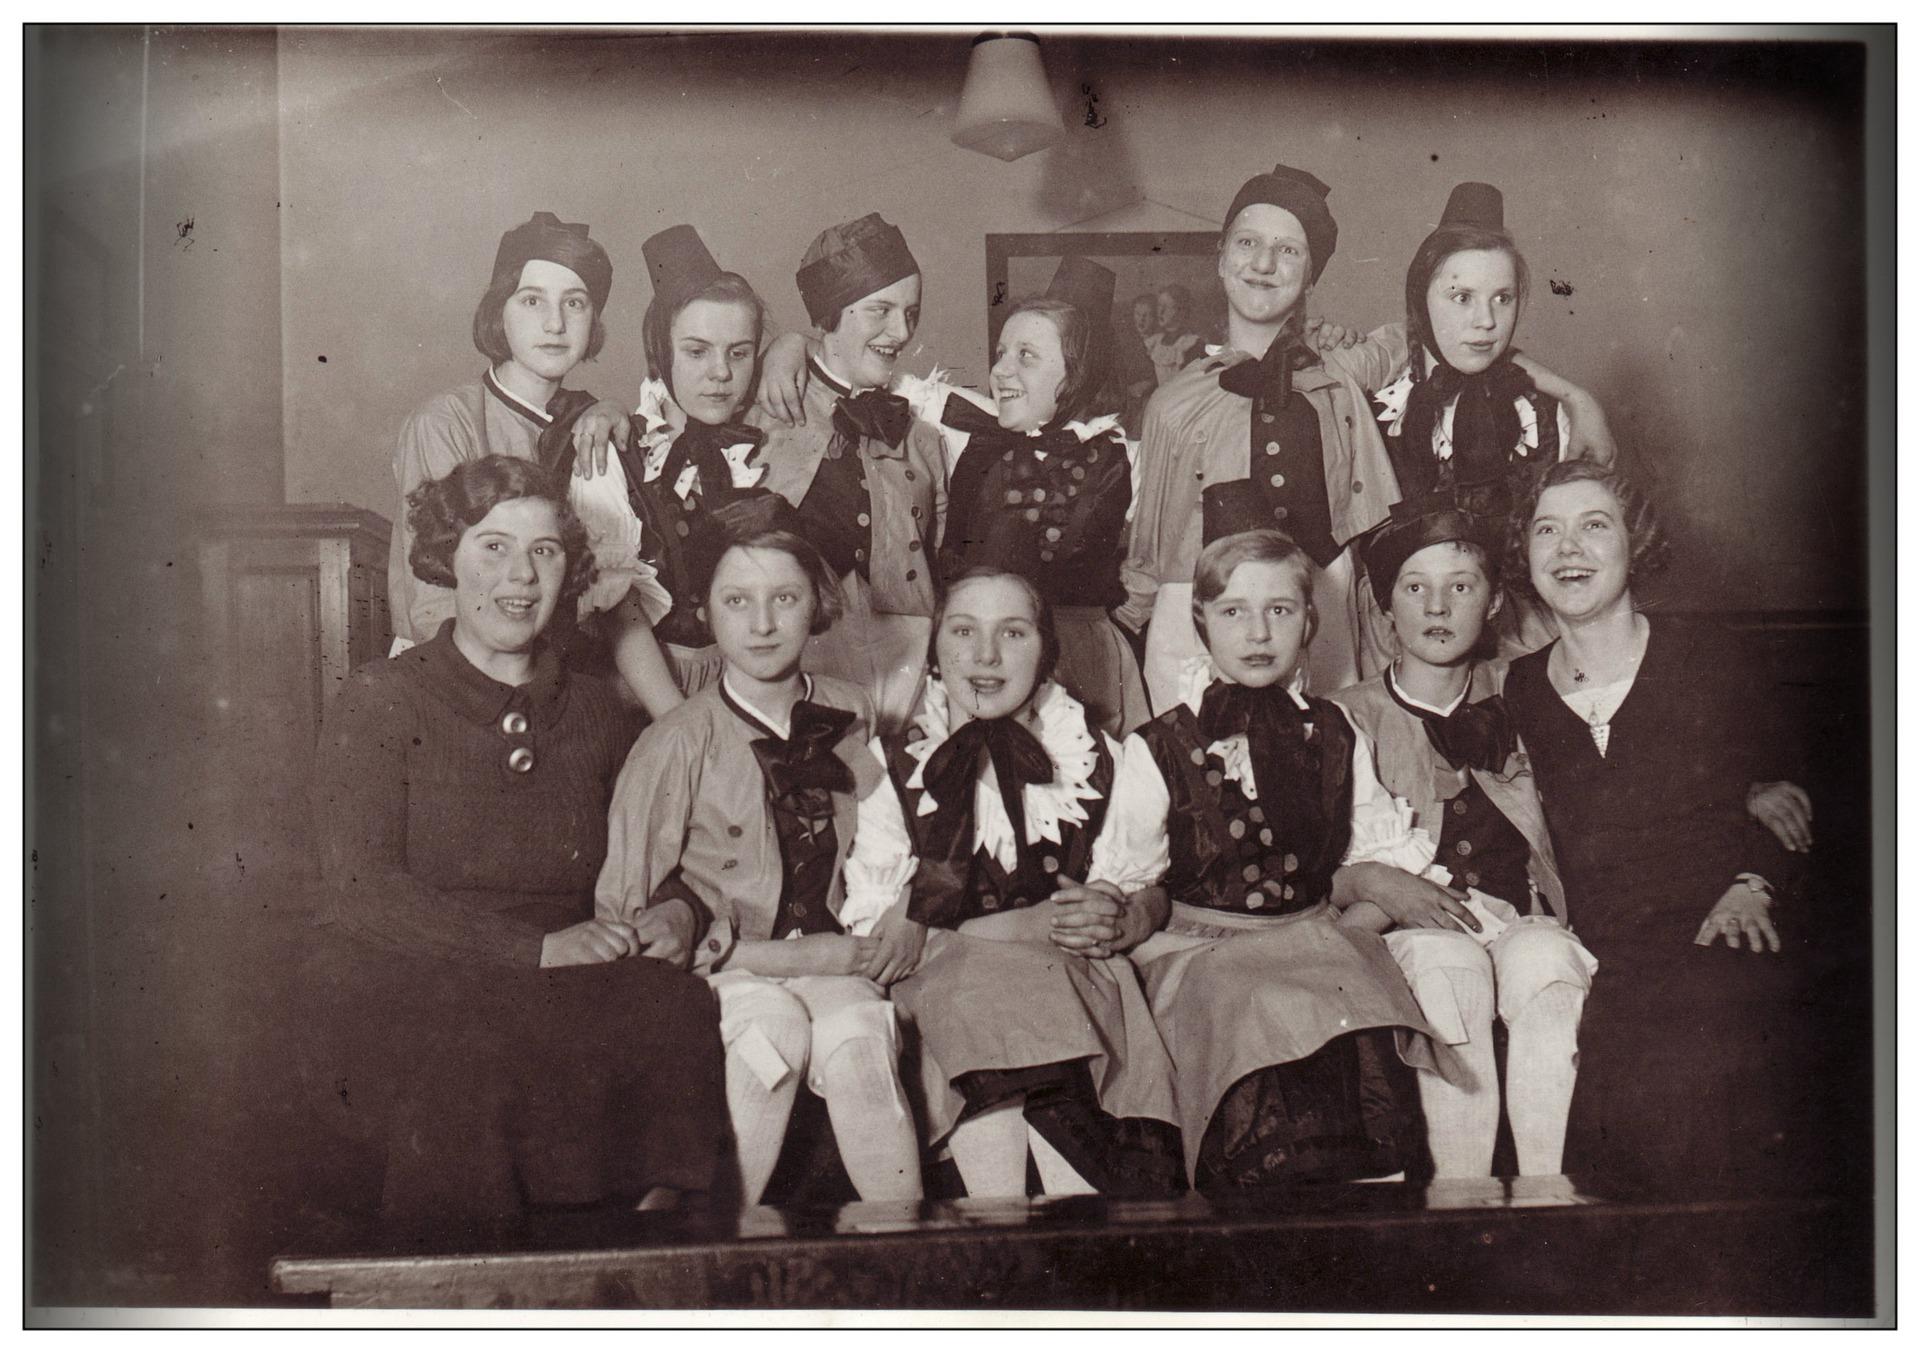 Storing Old Photos and Preserving Precious Memories - intro